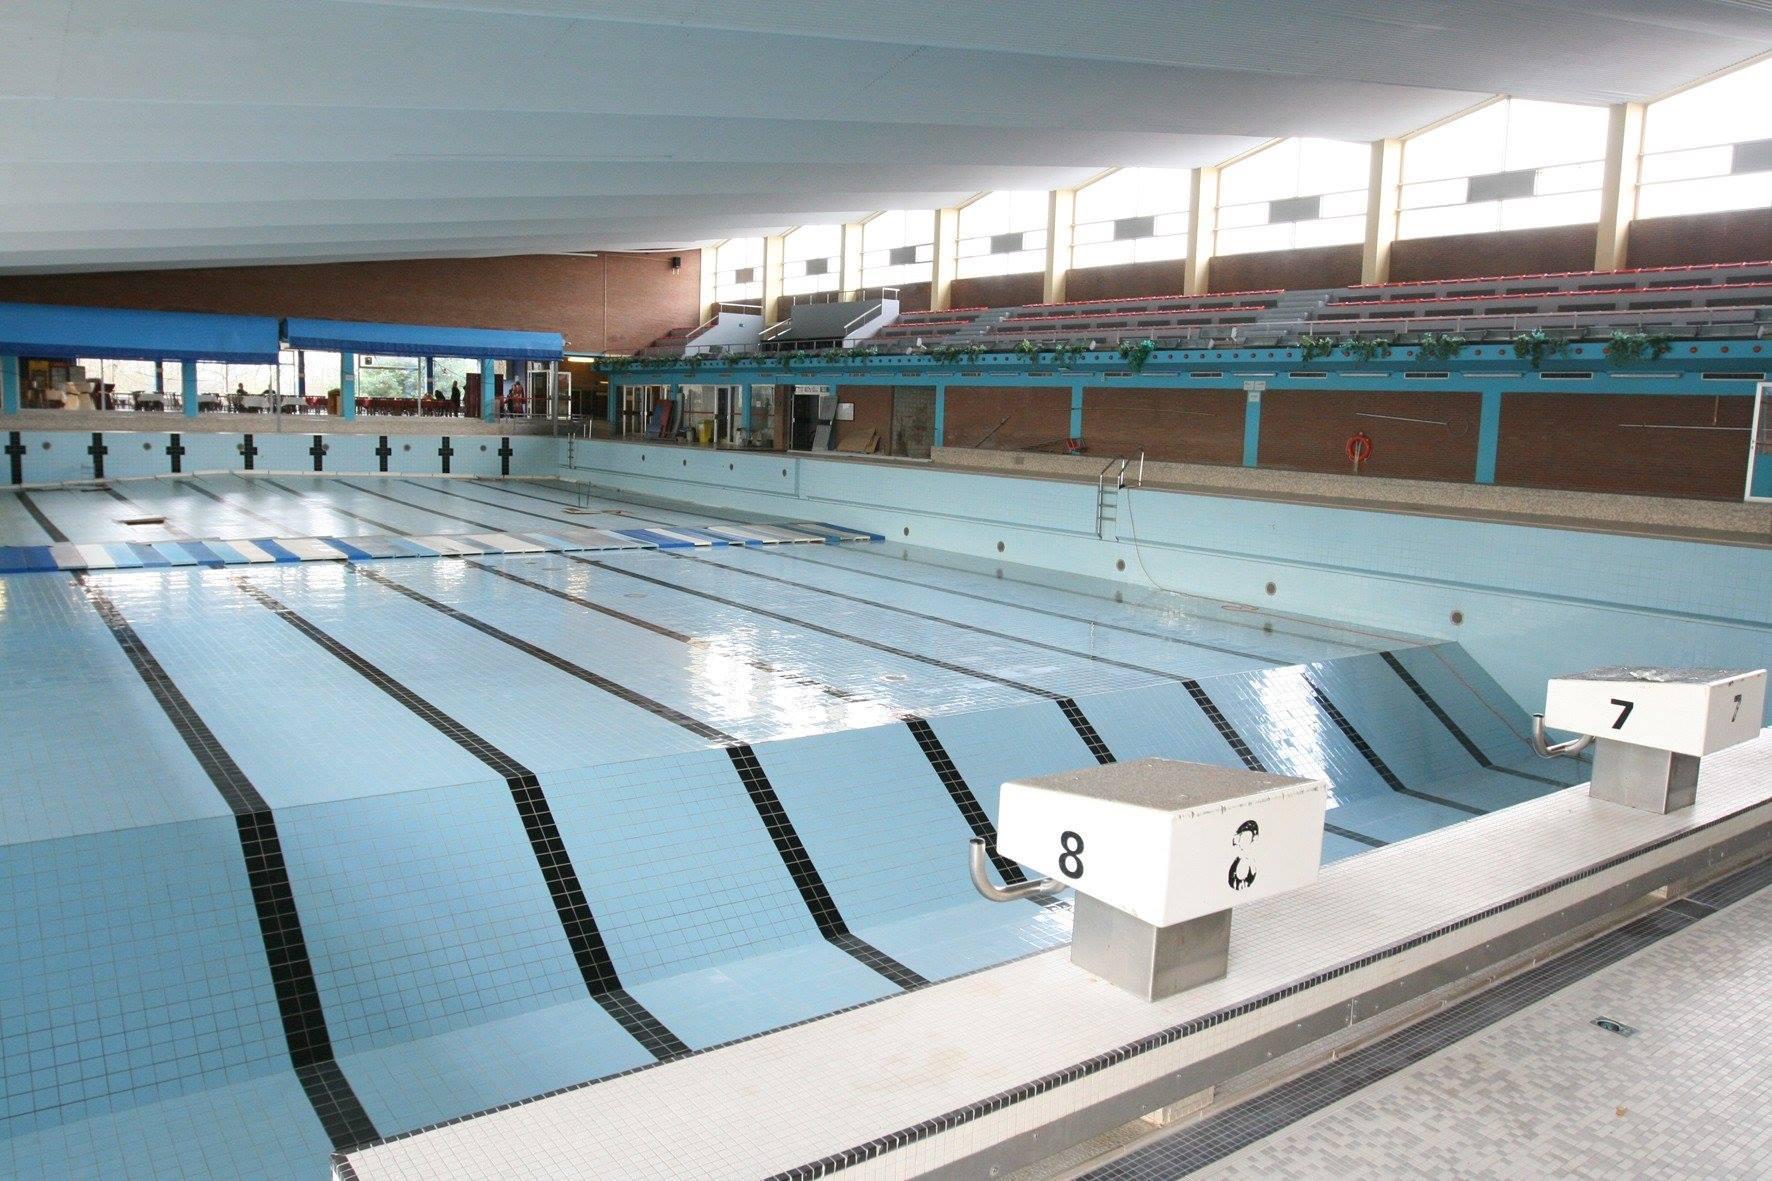 Fermeture de la piscine olympique ville de seraing for Brossolette piscine